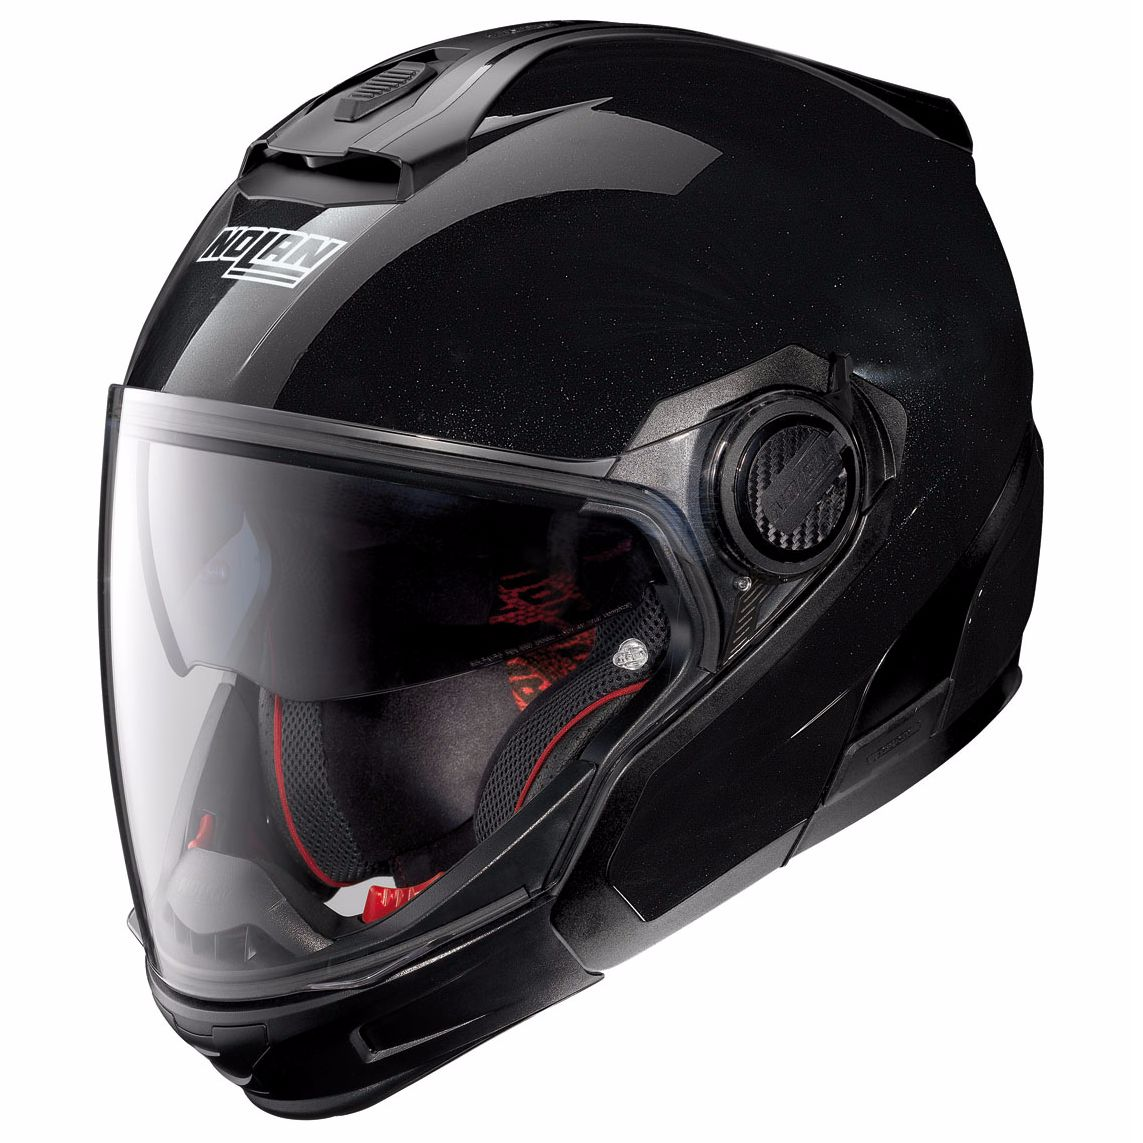 casco nolan n40 5 gt special n com casco integrale. Black Bedroom Furniture Sets. Home Design Ideas